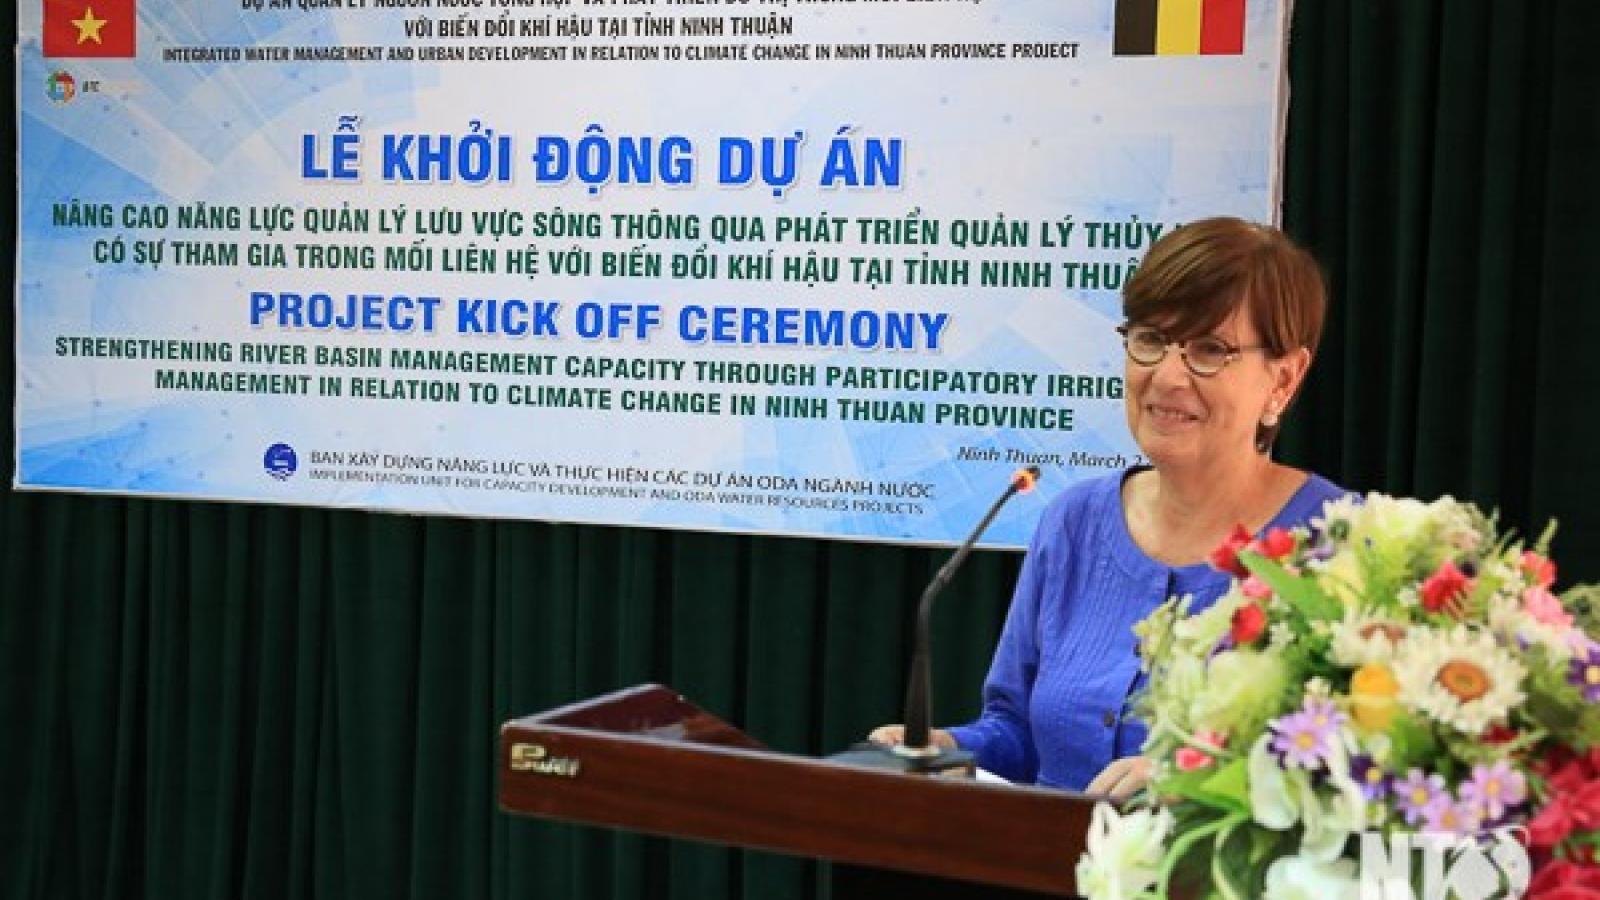 Belgium assists Ninh Thuan in river basin management